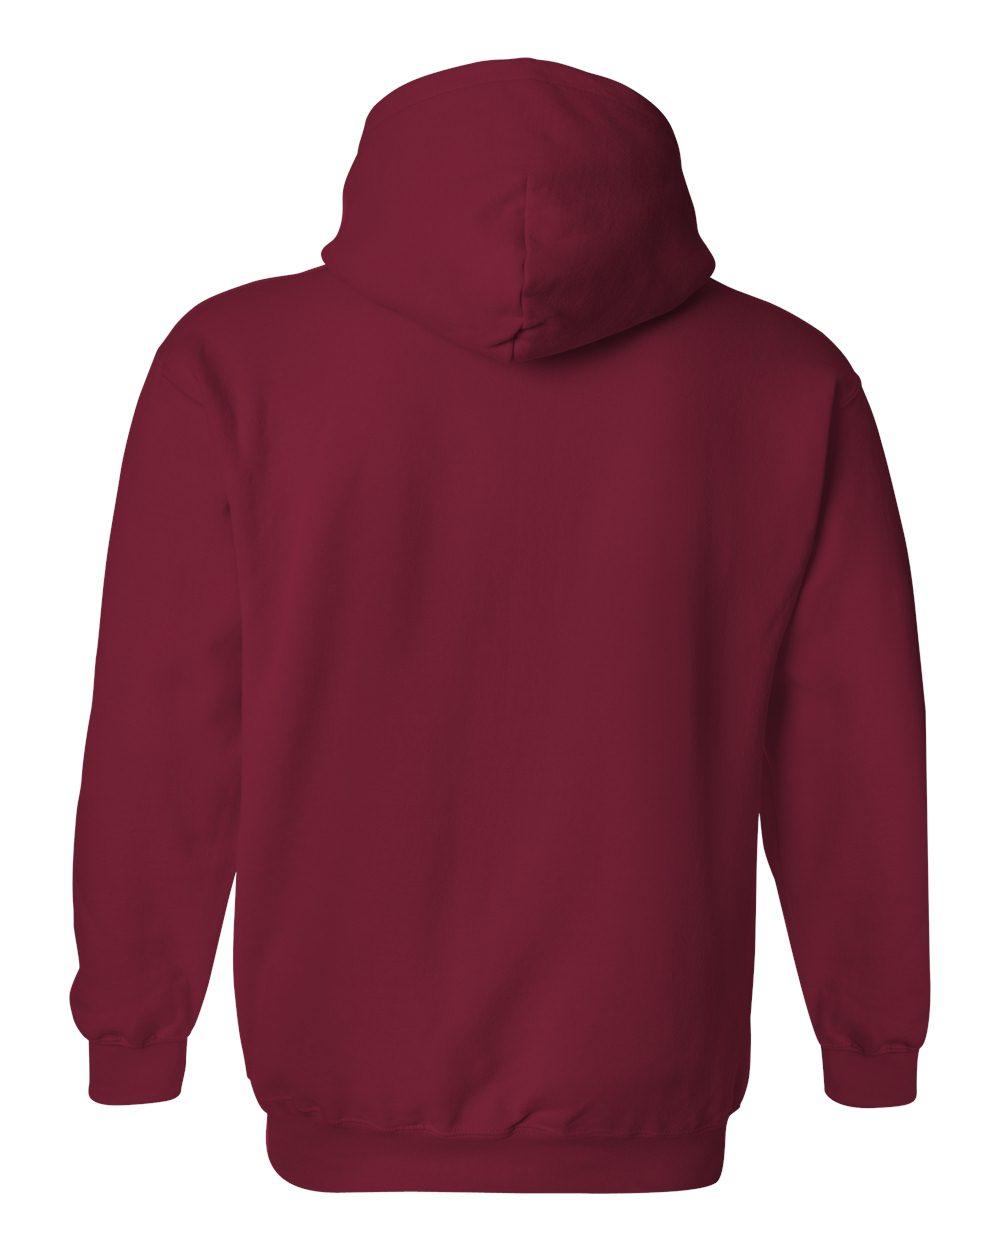 Gildan-Mens-Blank-Hoodie-Heavy-Blend-Hooded-Sweatshirt-Solid-18500-up-to-5XL thumbnail 13